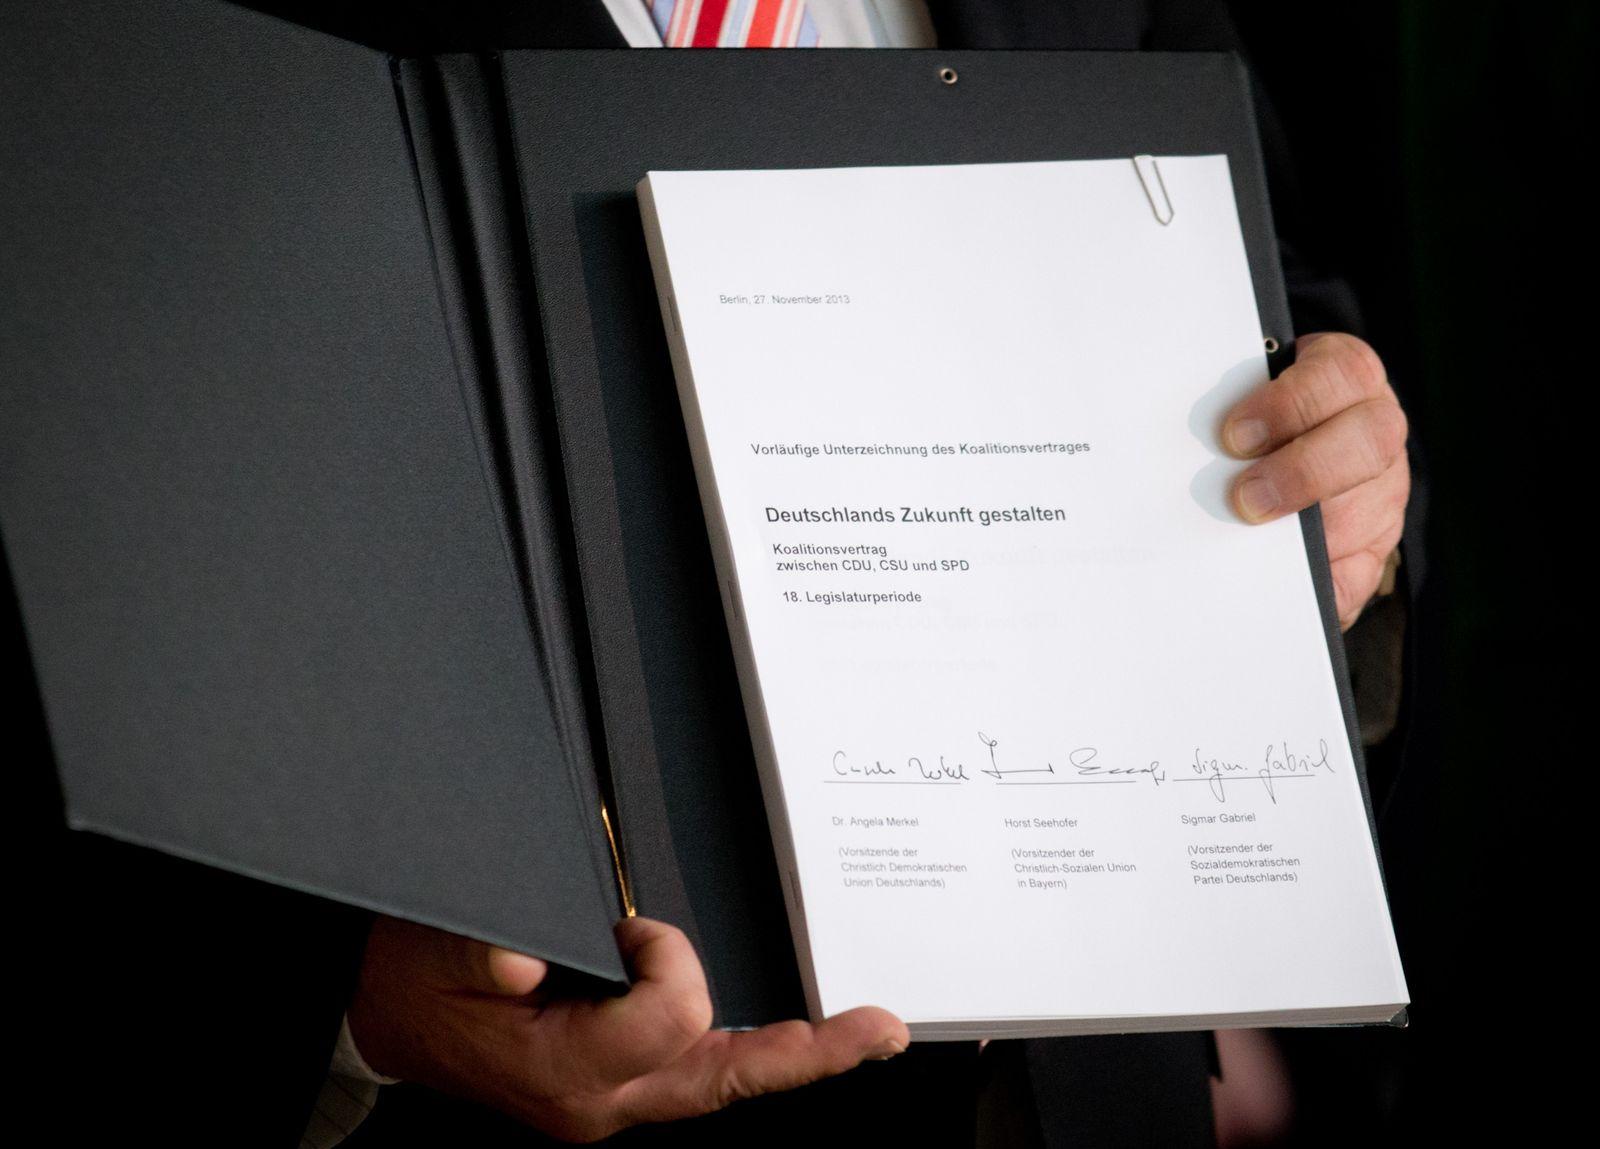 KaSP Gabriel Unterschrift / Koalitionsvertrag (Kopie)